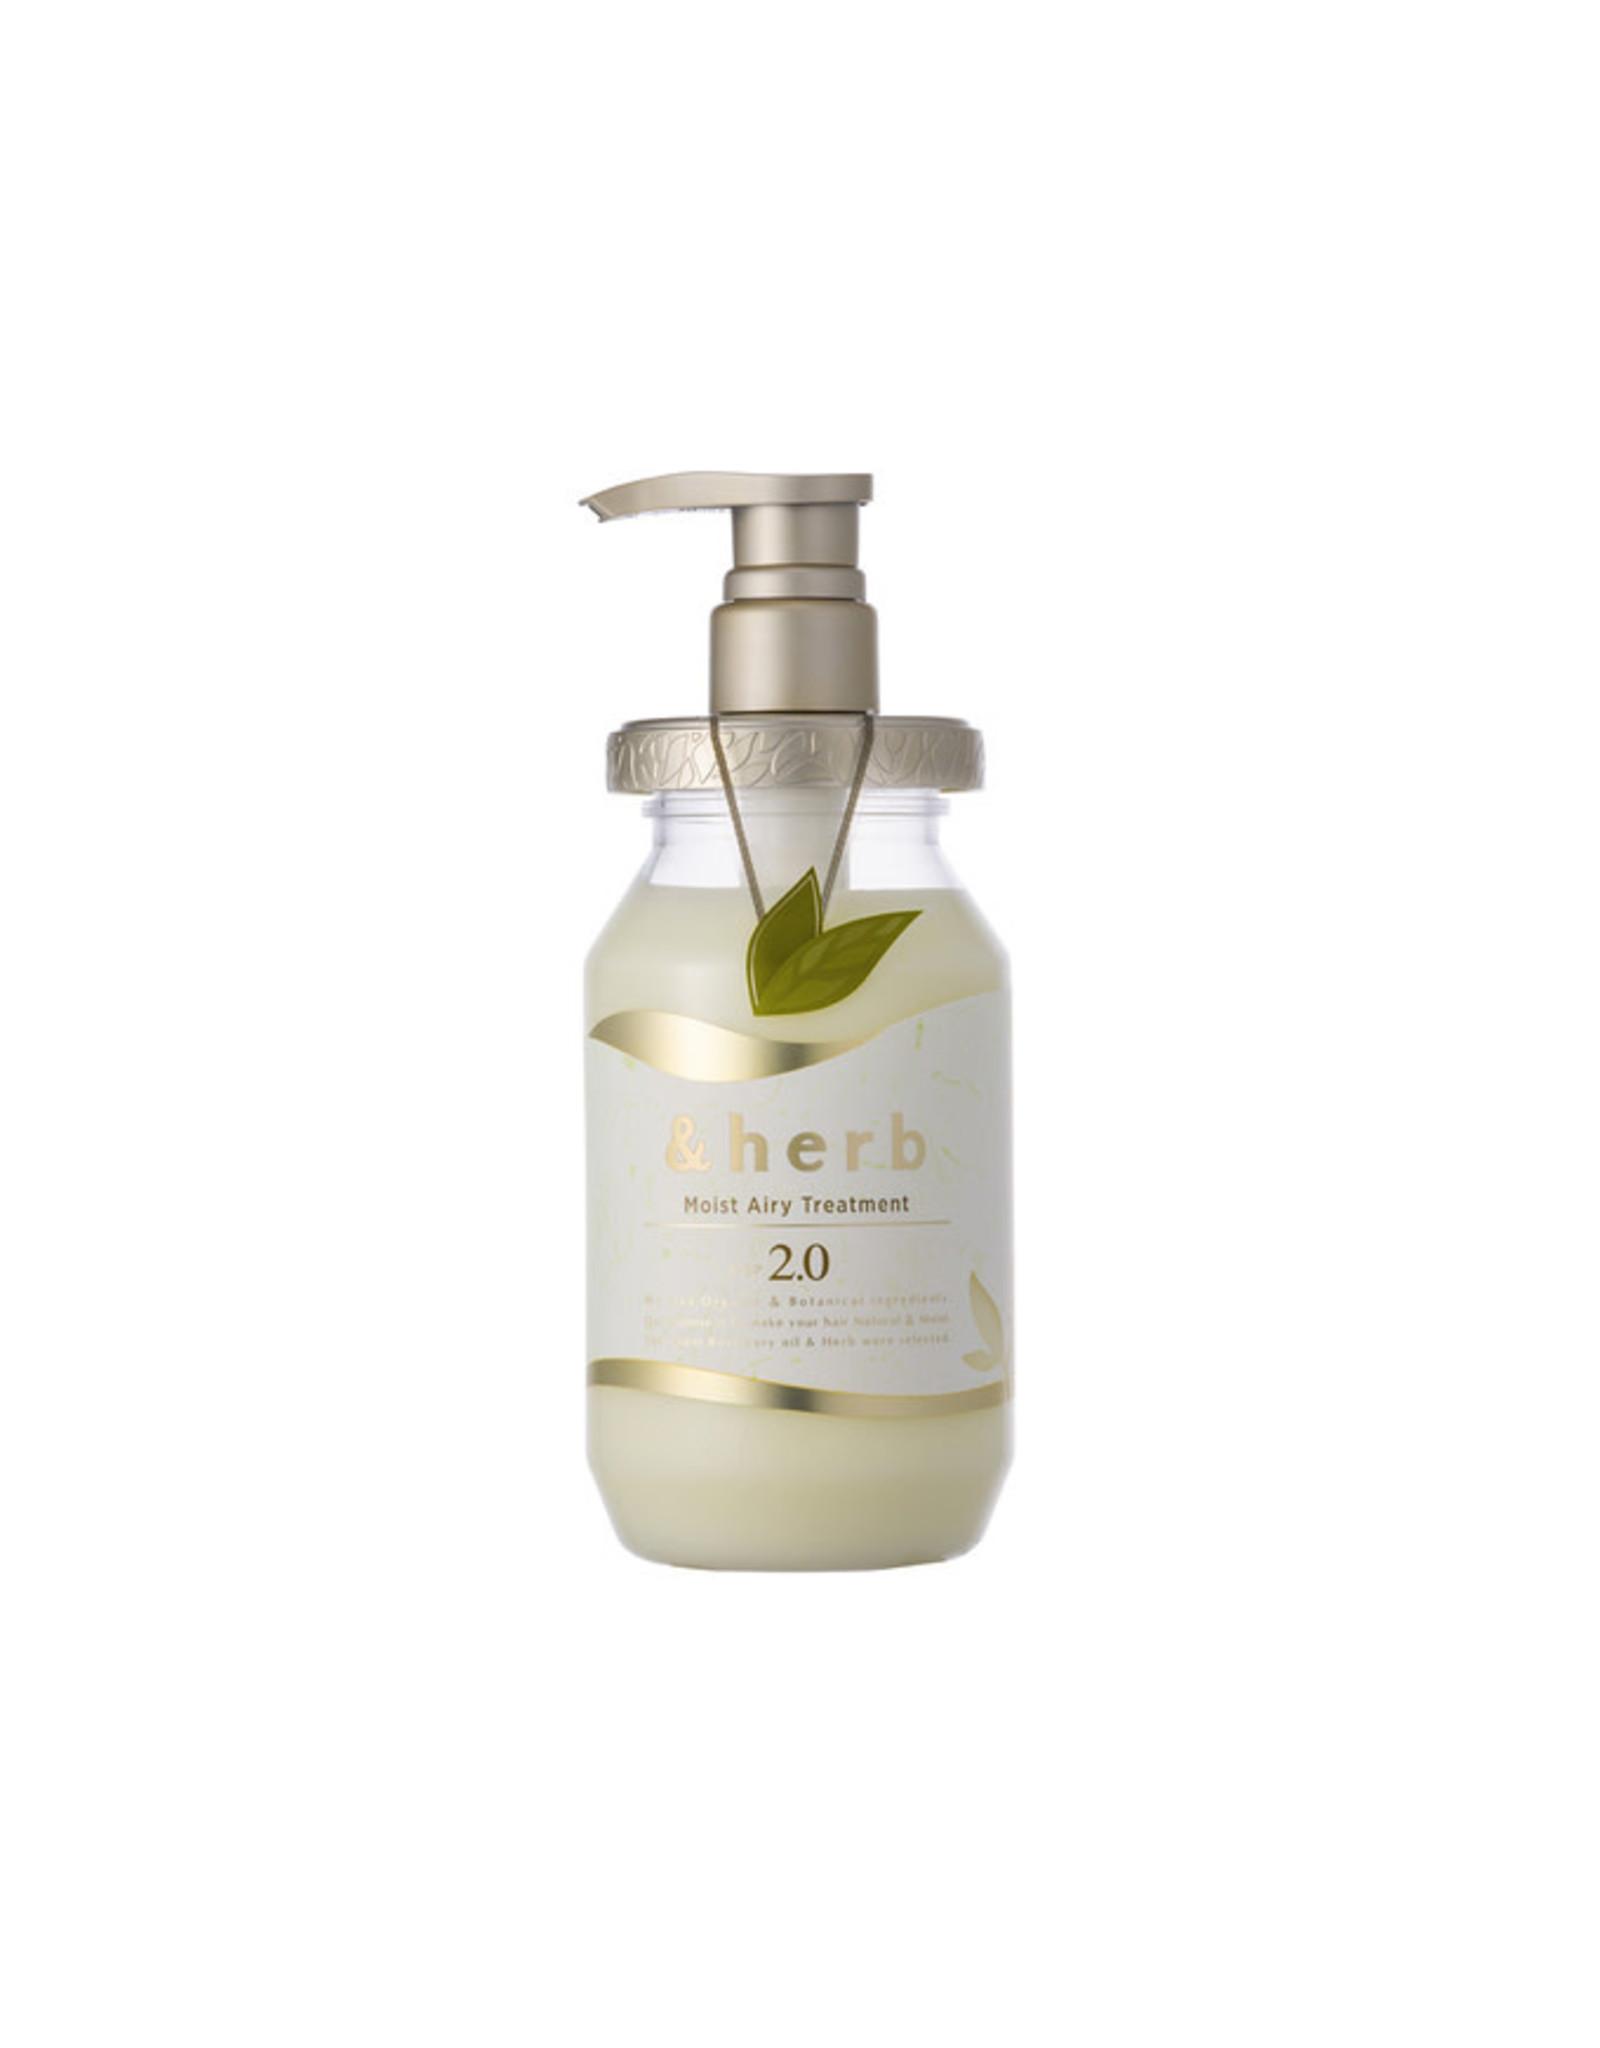 Vicrea Herb Moist Airy Treatment 2.0 480ml